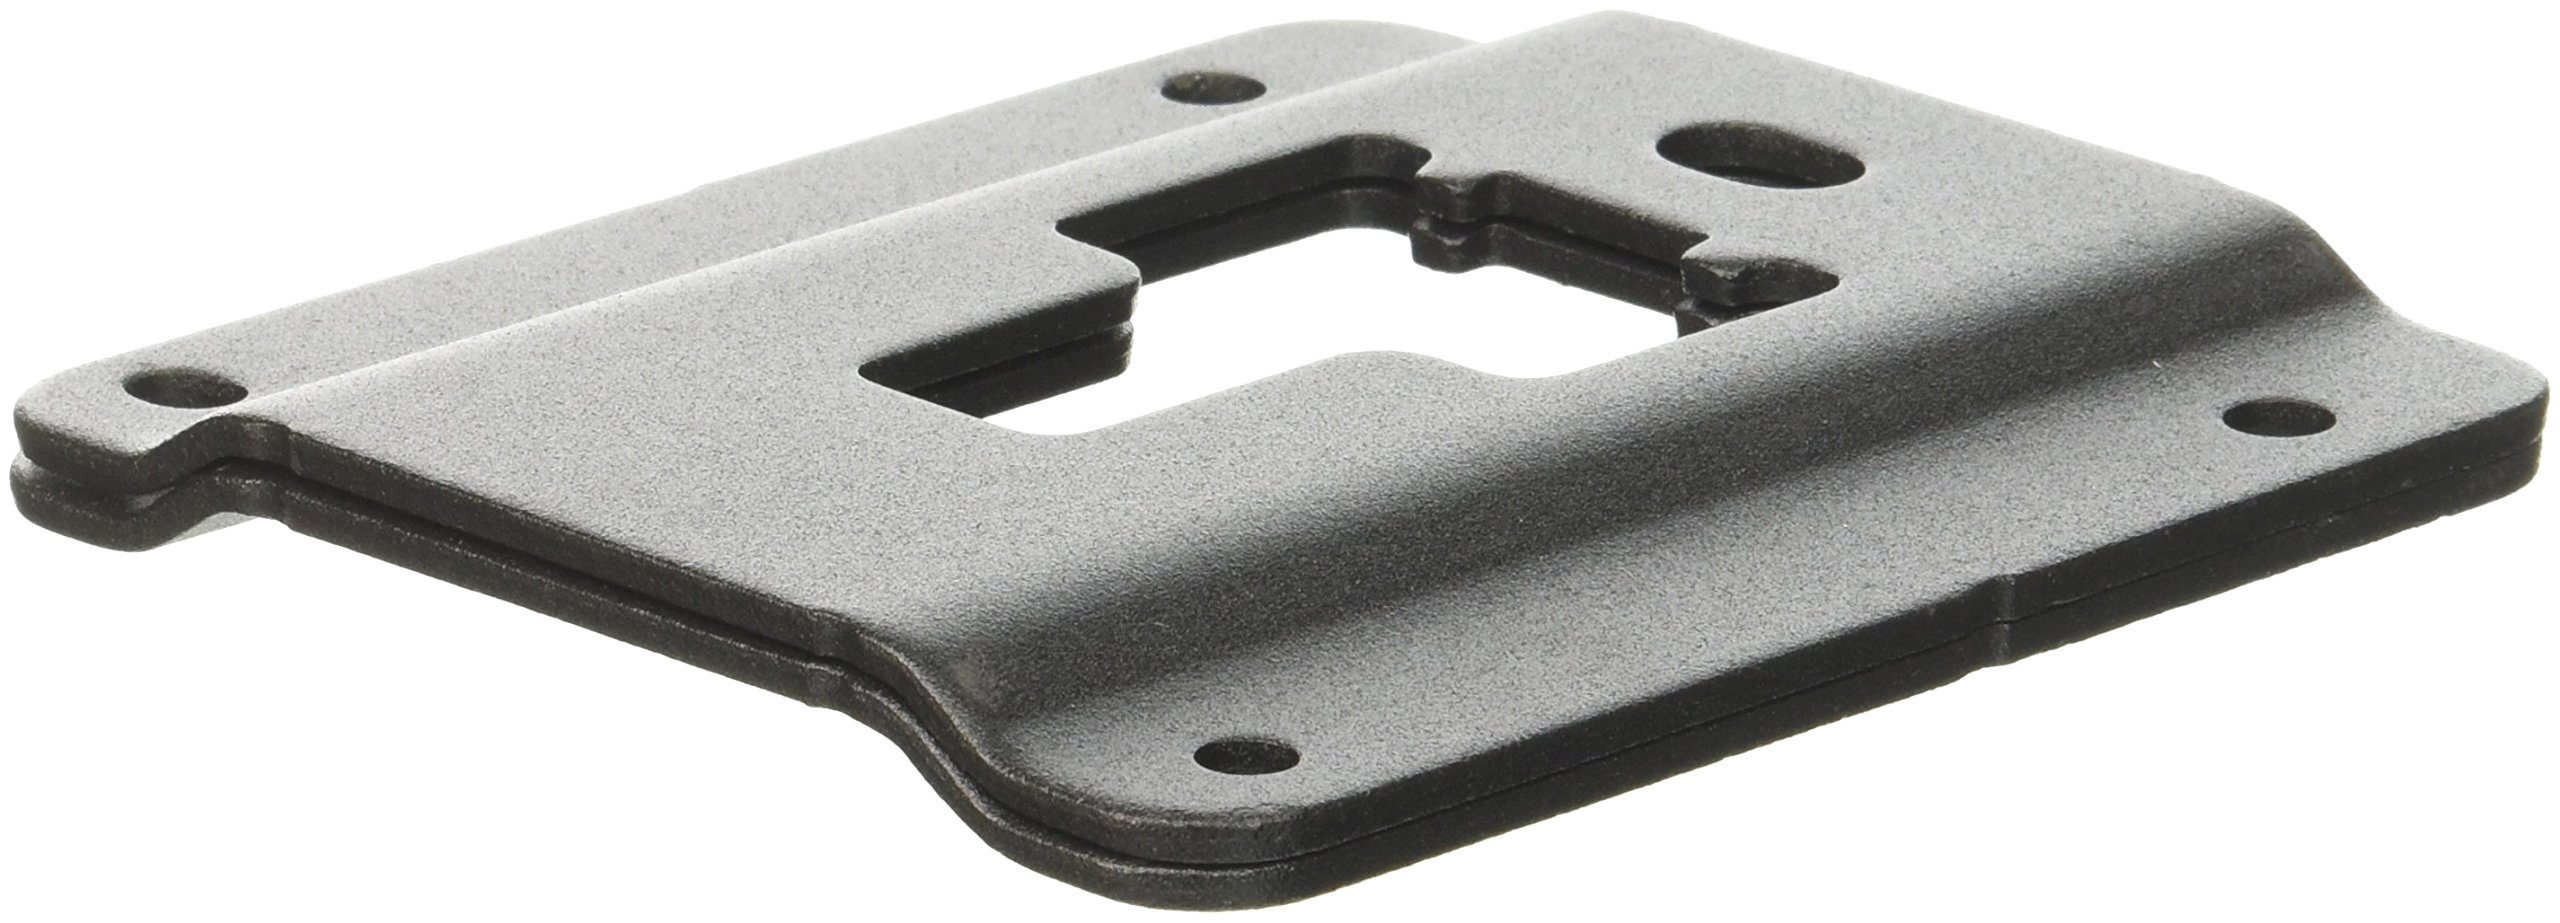 Genuine Ford FL3Z-9928408-AB Bed Load Hook Reinforcement Panel, Black by Ford